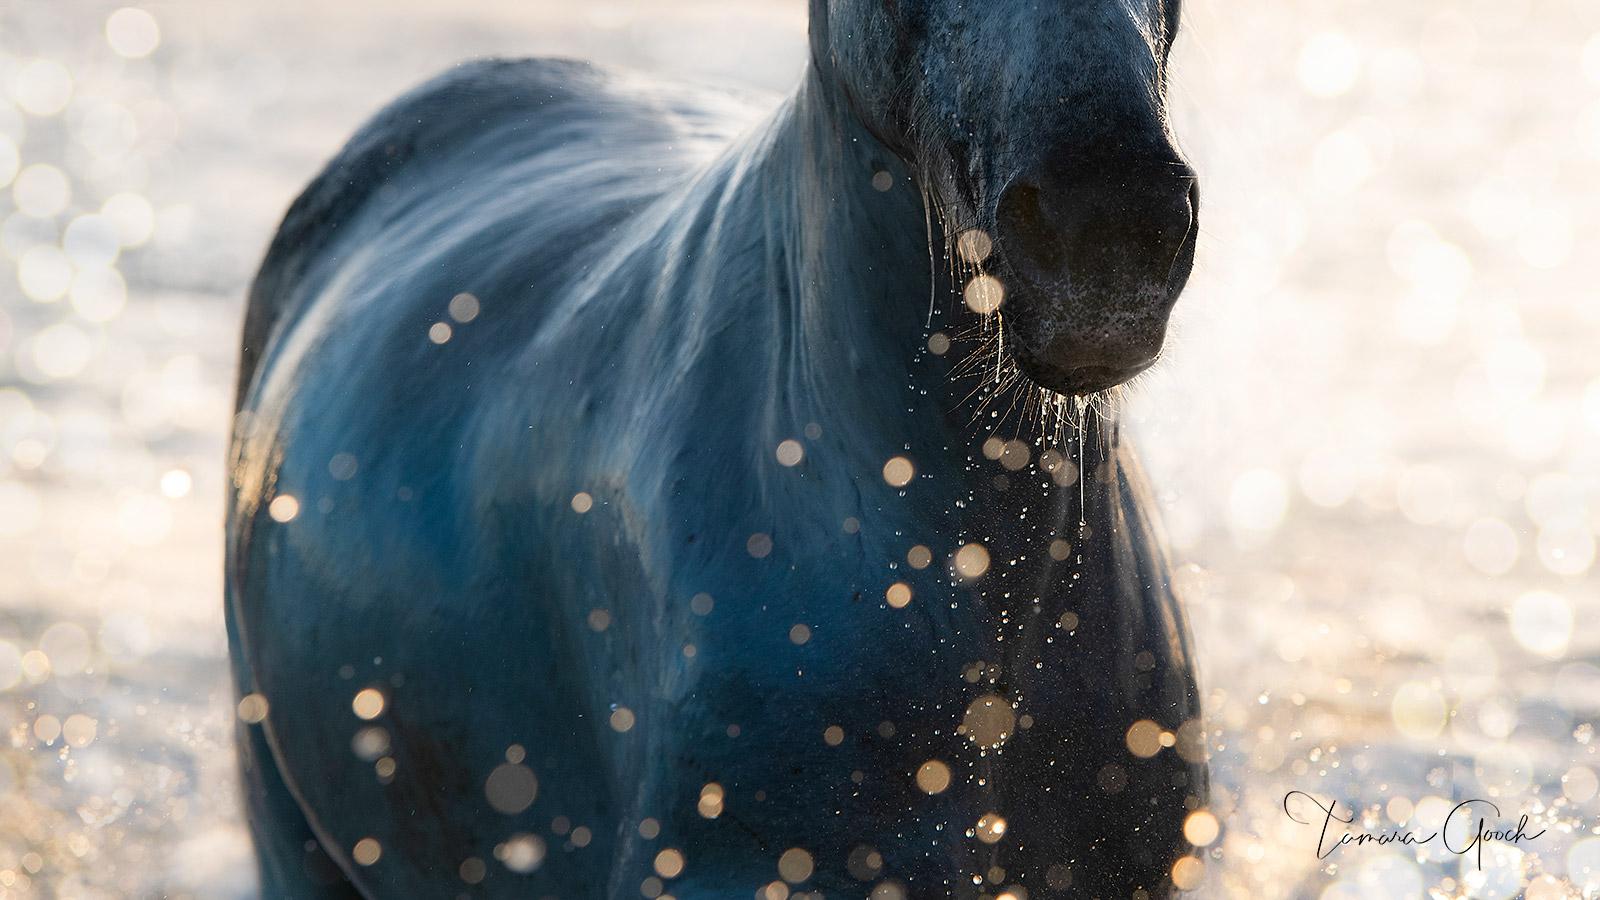 Camargue, bokeh, water, splashing, sea, ocean, Mediterranean, France, Provence, print, limited edition,  horse, white, horse photos, horse art, horse photography, equine, equine photography, fine art,, photo